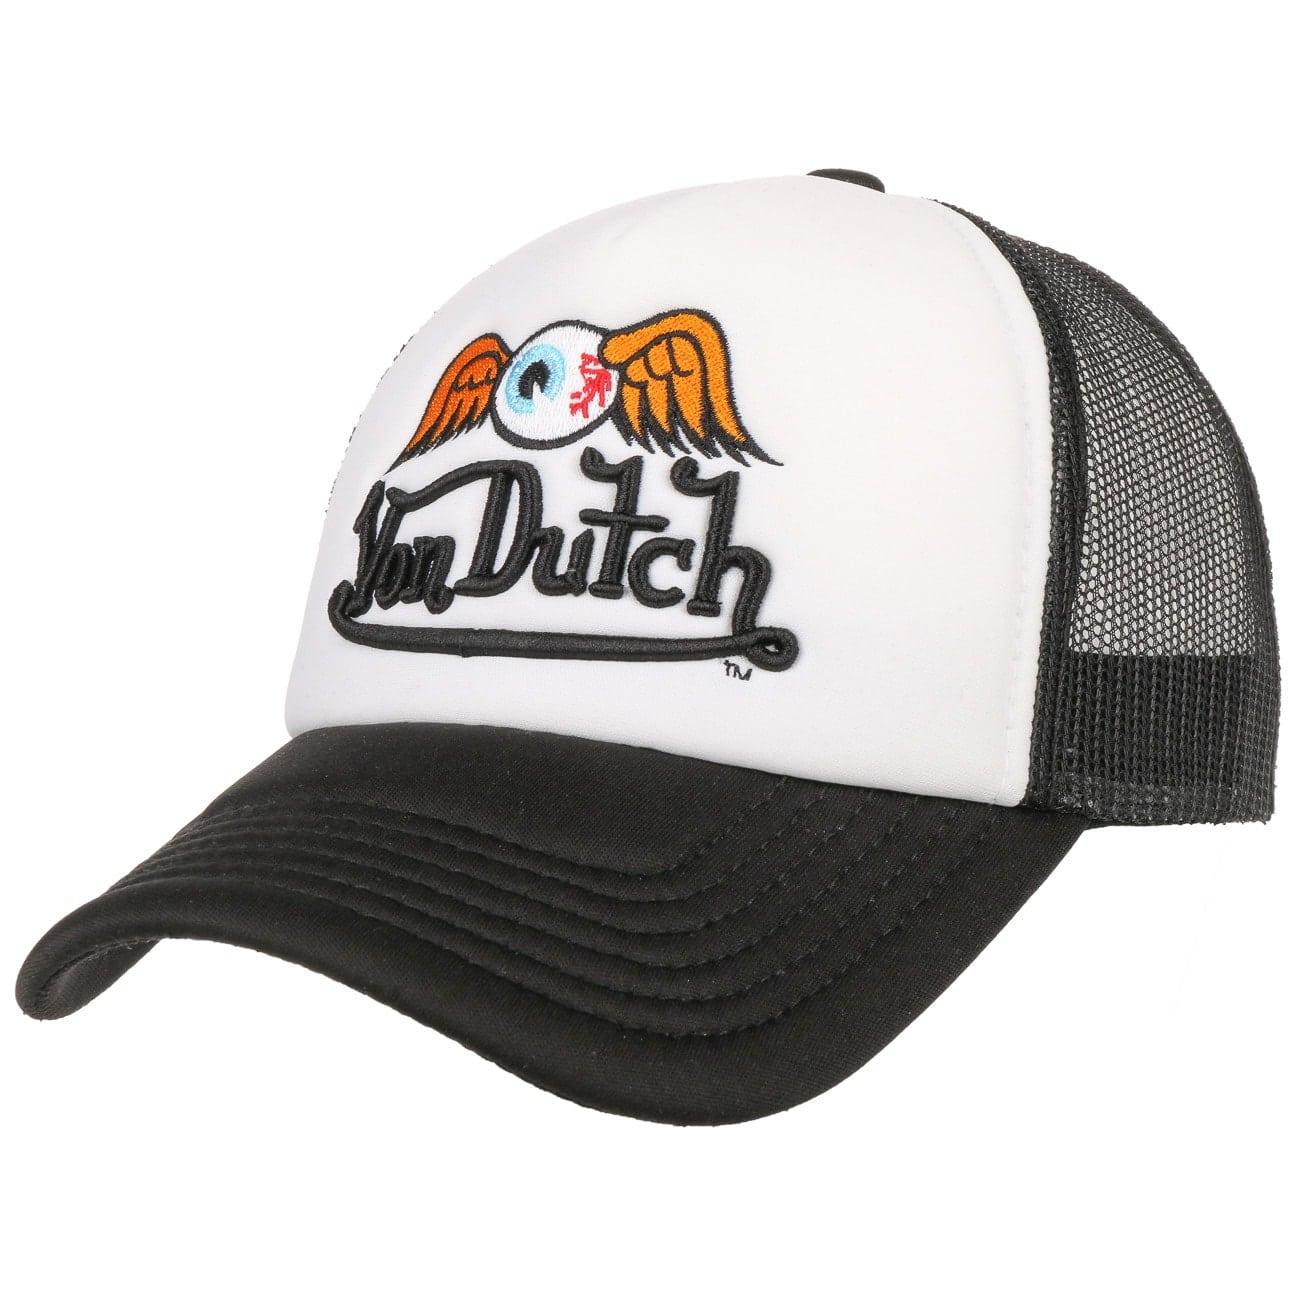 Gorra Trucker Eyeball by Von Dutch  gorra de baseball